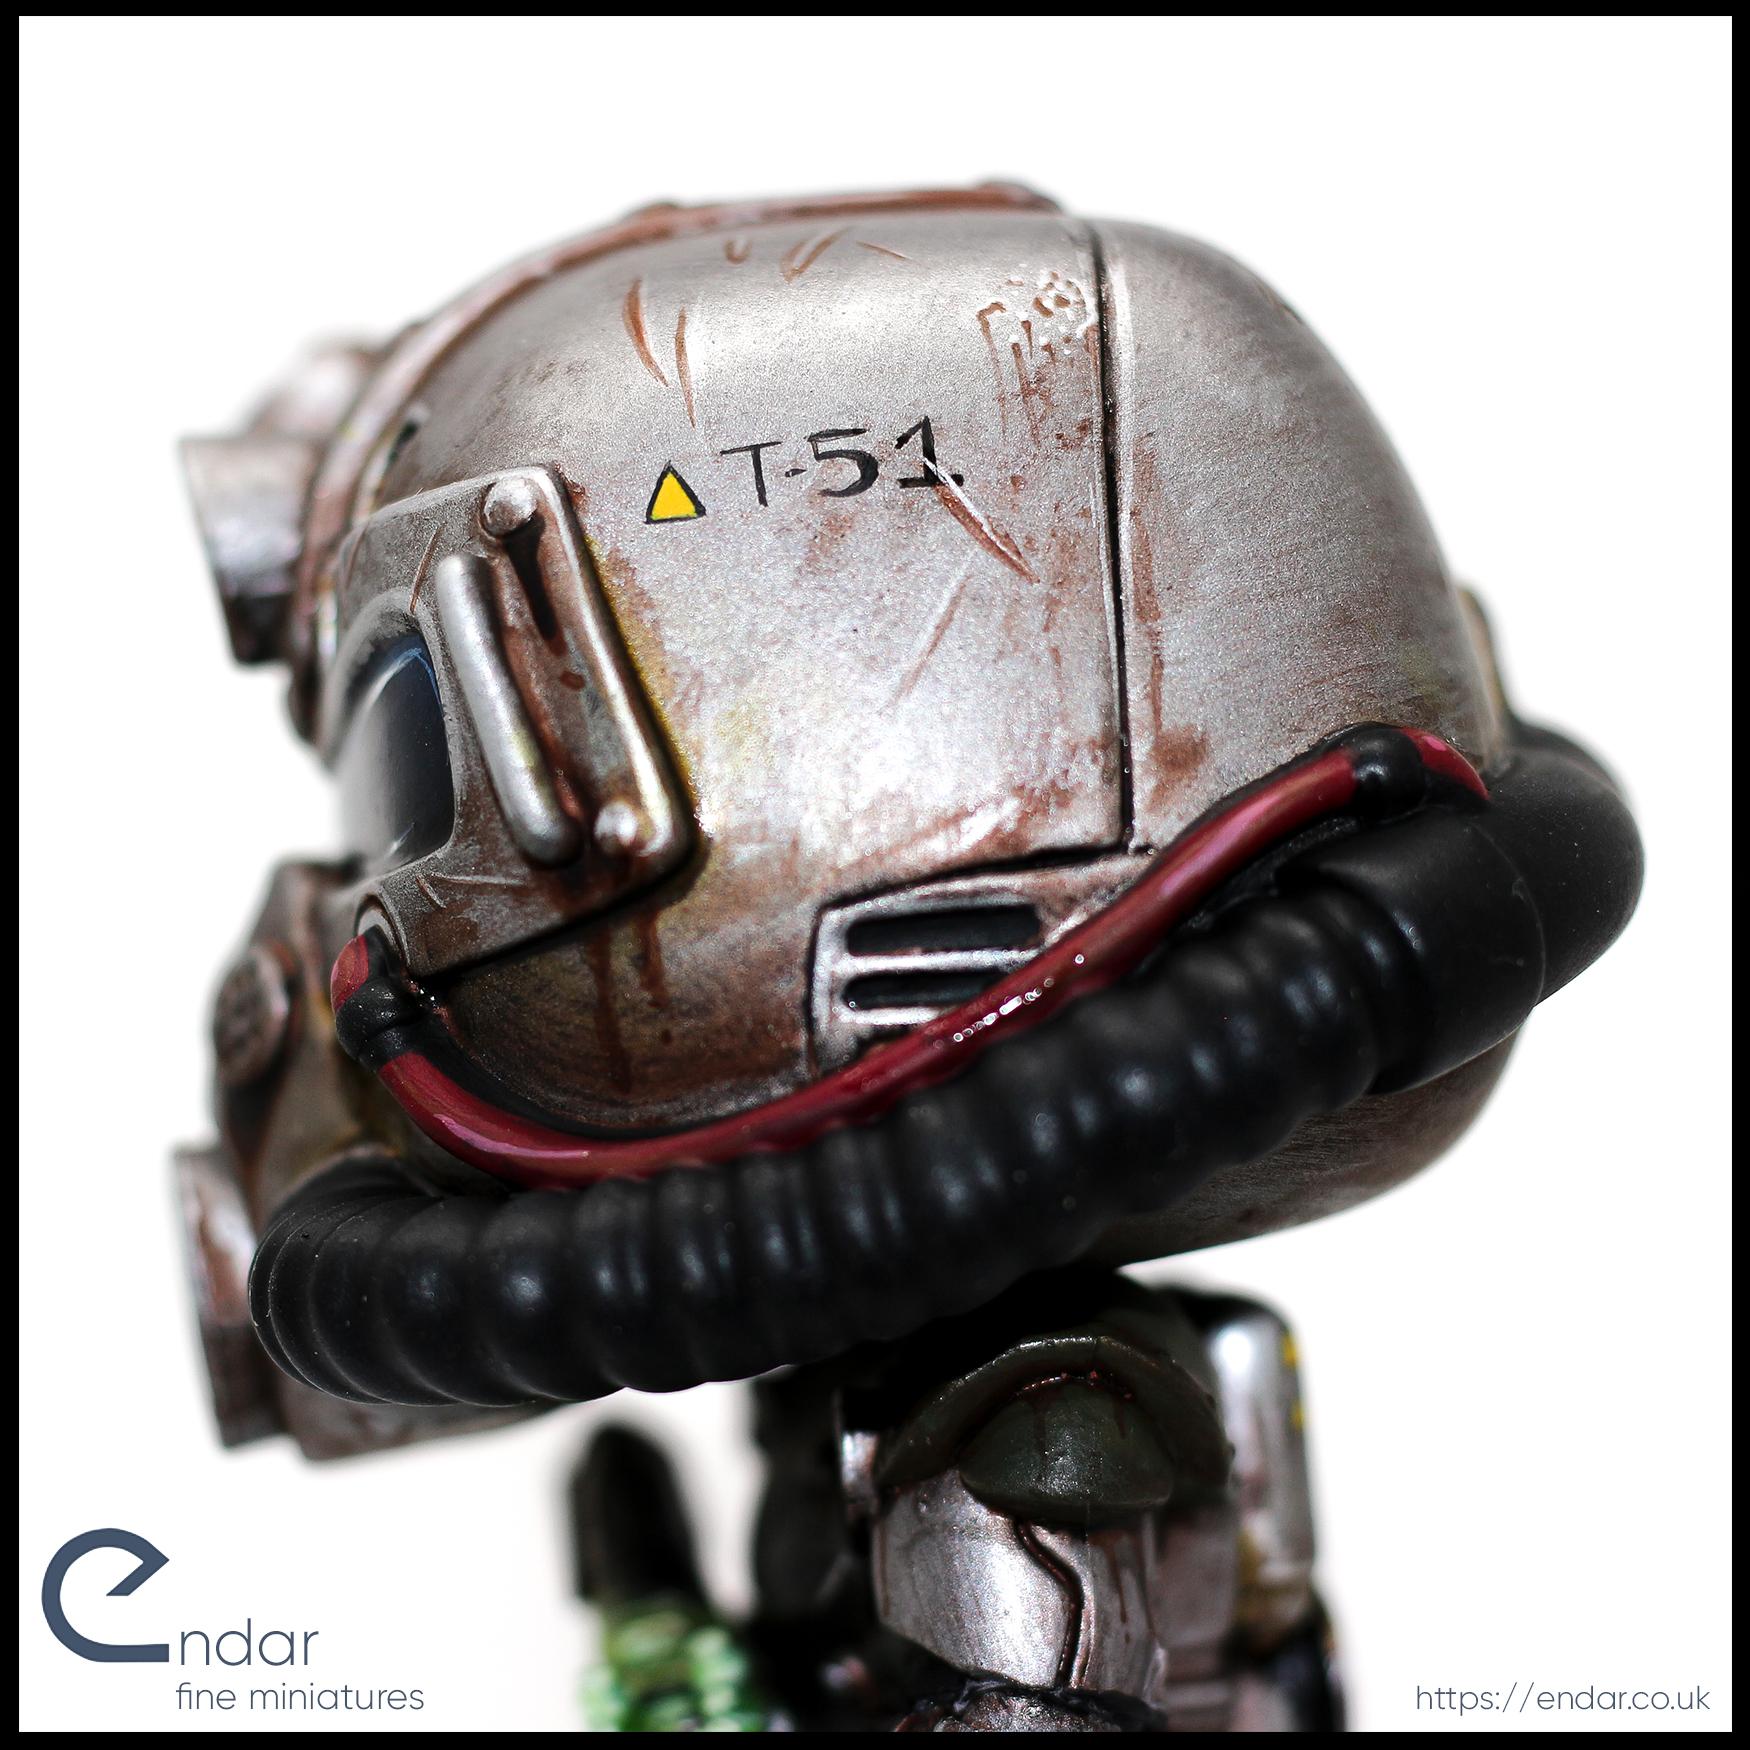 T51 Detail Headprofile.jpg